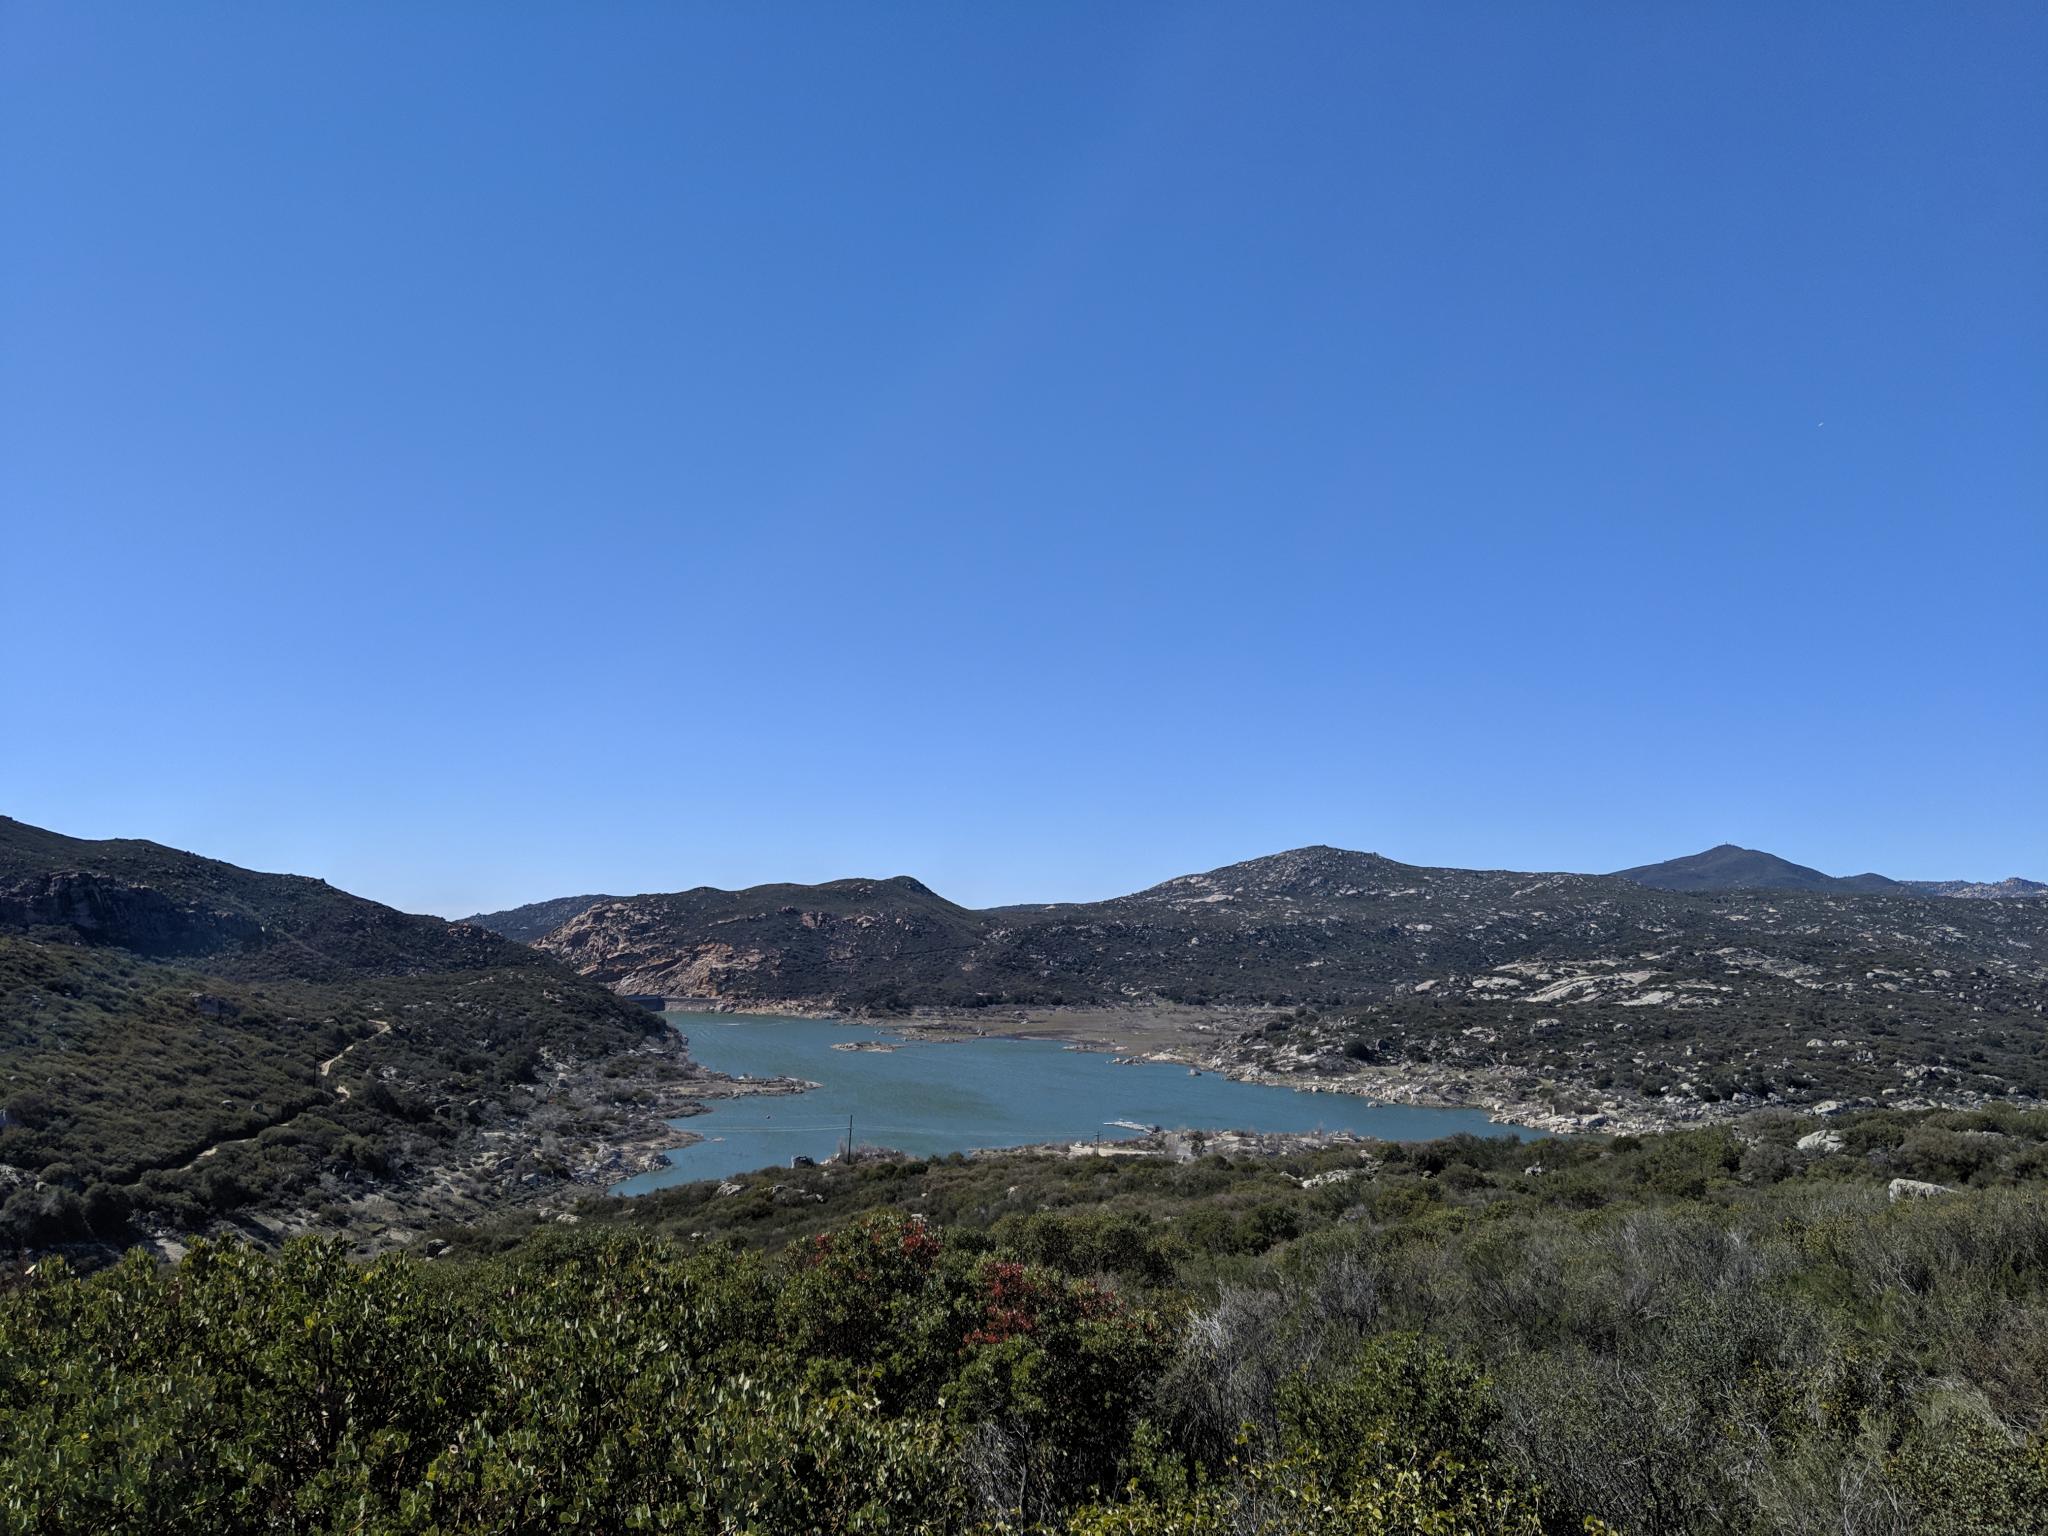 Le lac Morena • The Lake Morena